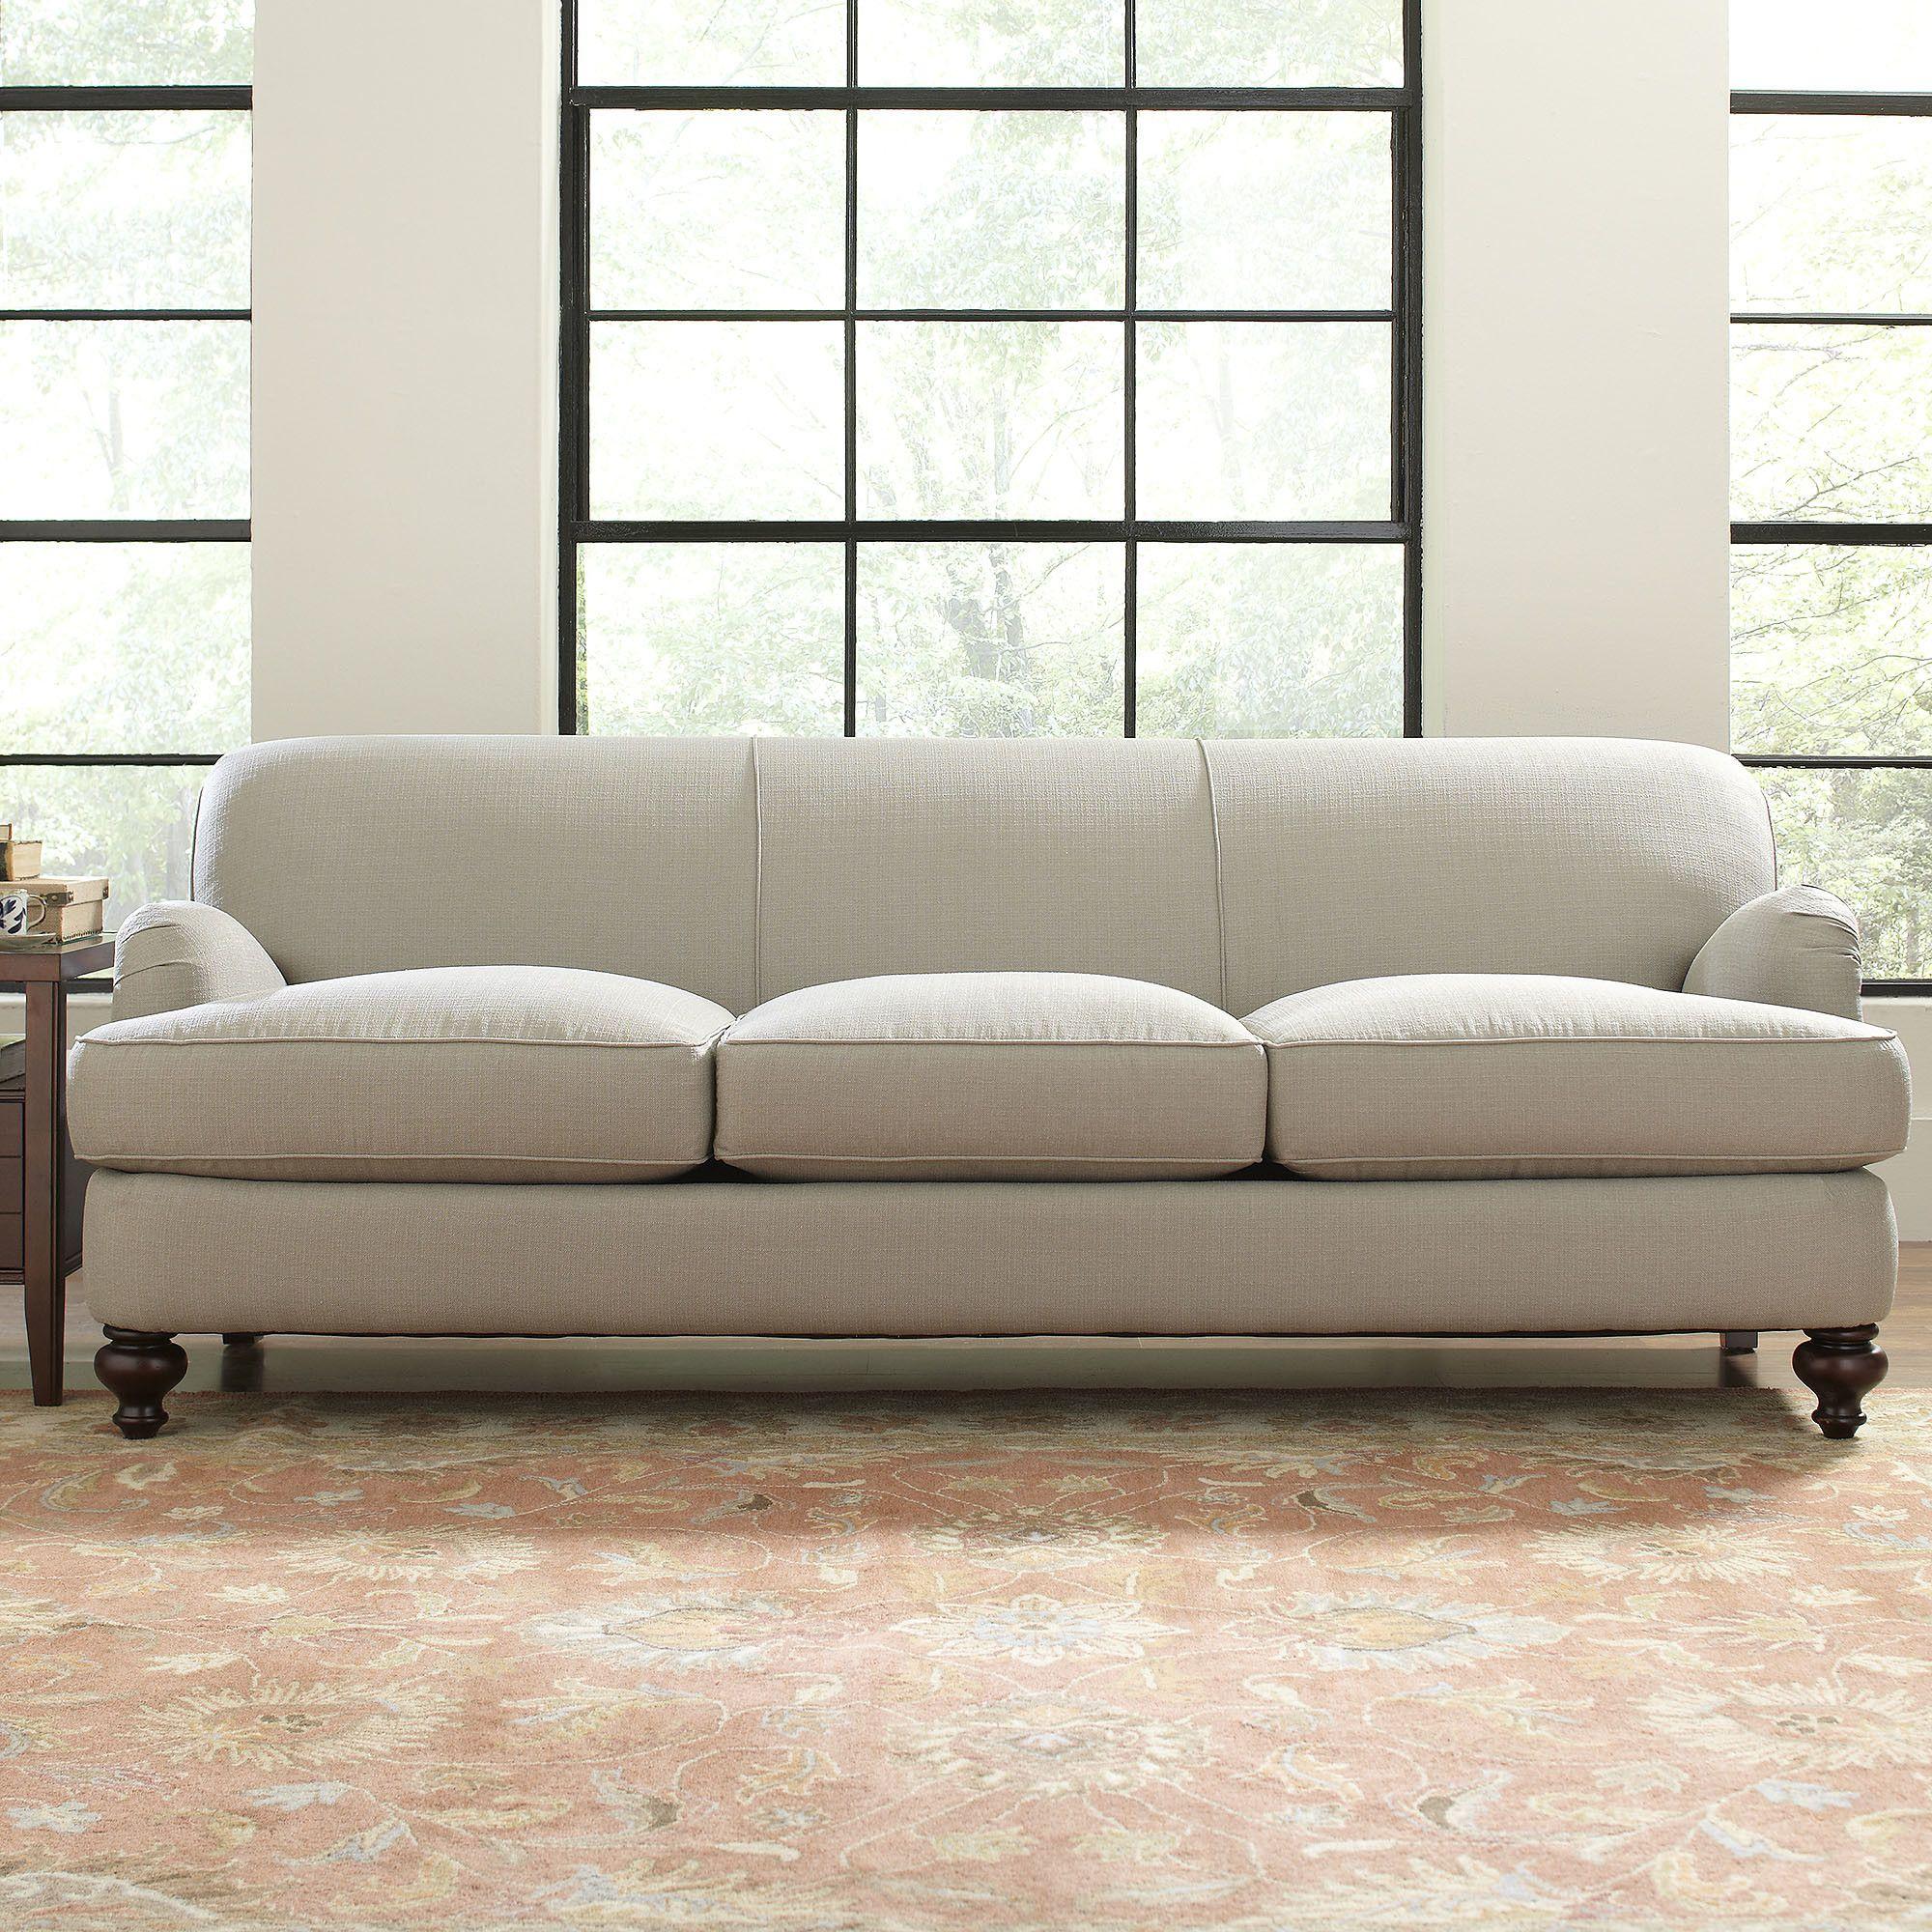 Birch Lane Durham Sofa U0026 Reviews | Wayfair